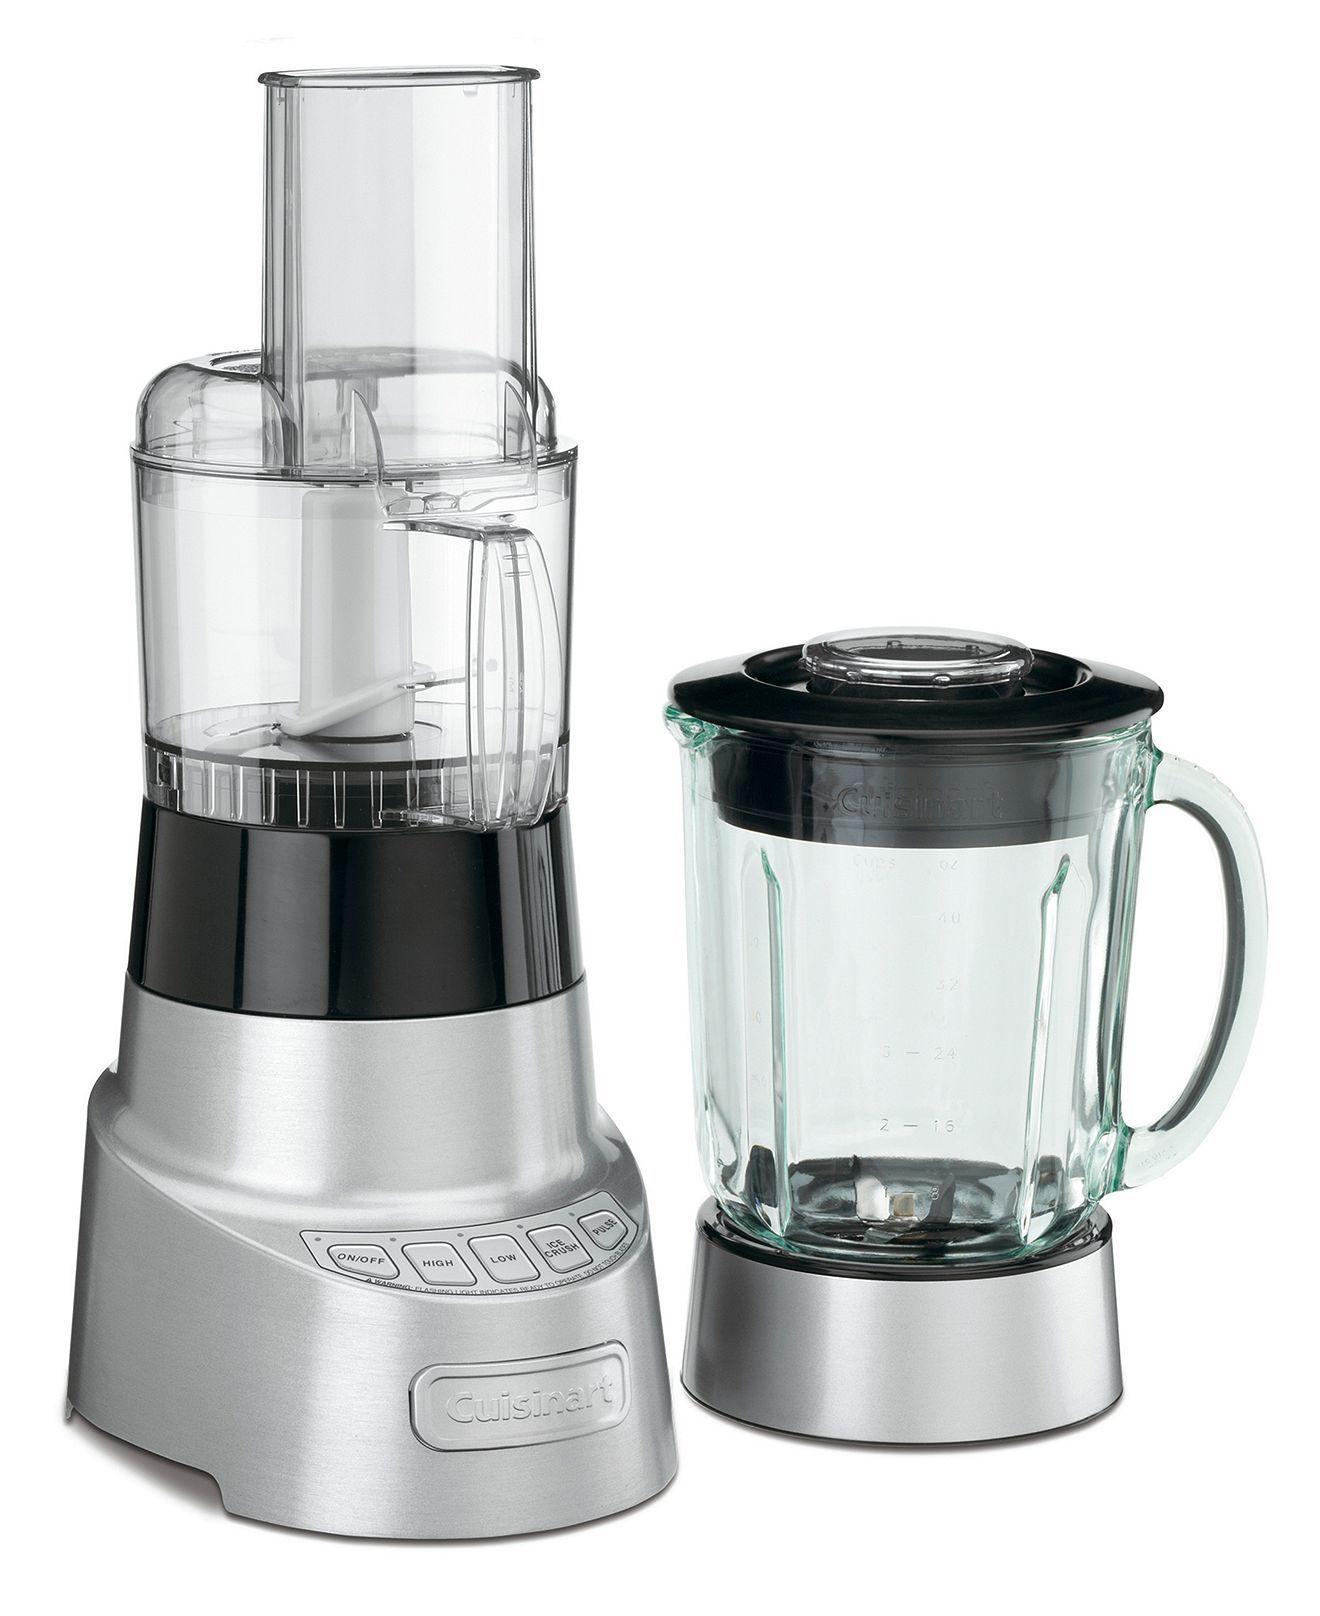 Cuisinart BFP-603 Blender and Food Processor, SmartPower Deluxe - Electrics - Kitchen - Macy's